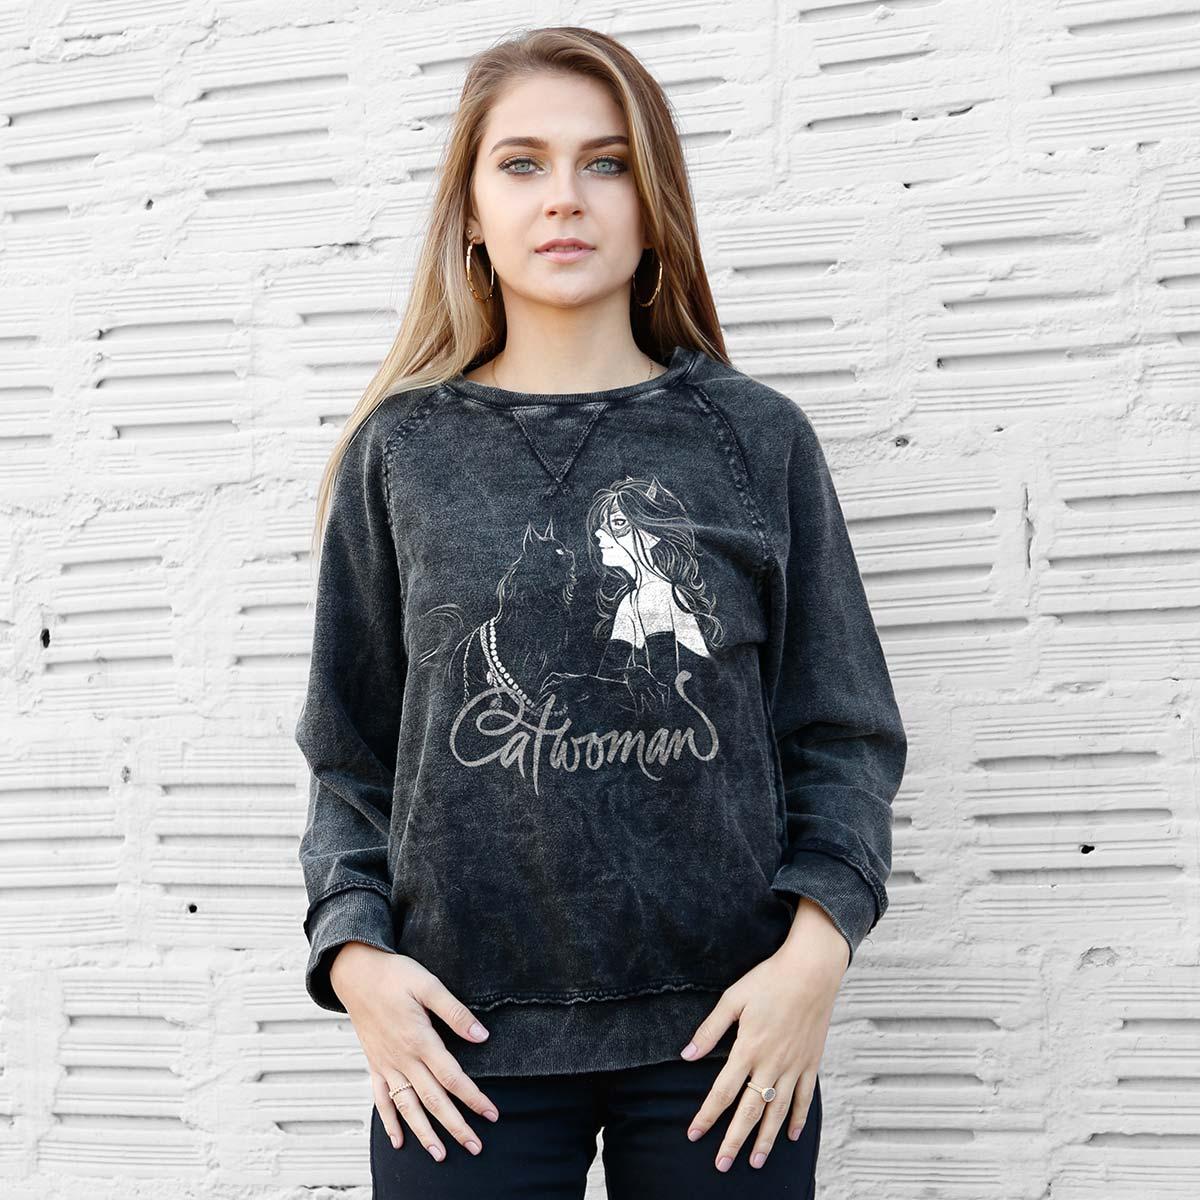 Moletinho Marmorizado Jewel of Catwoman